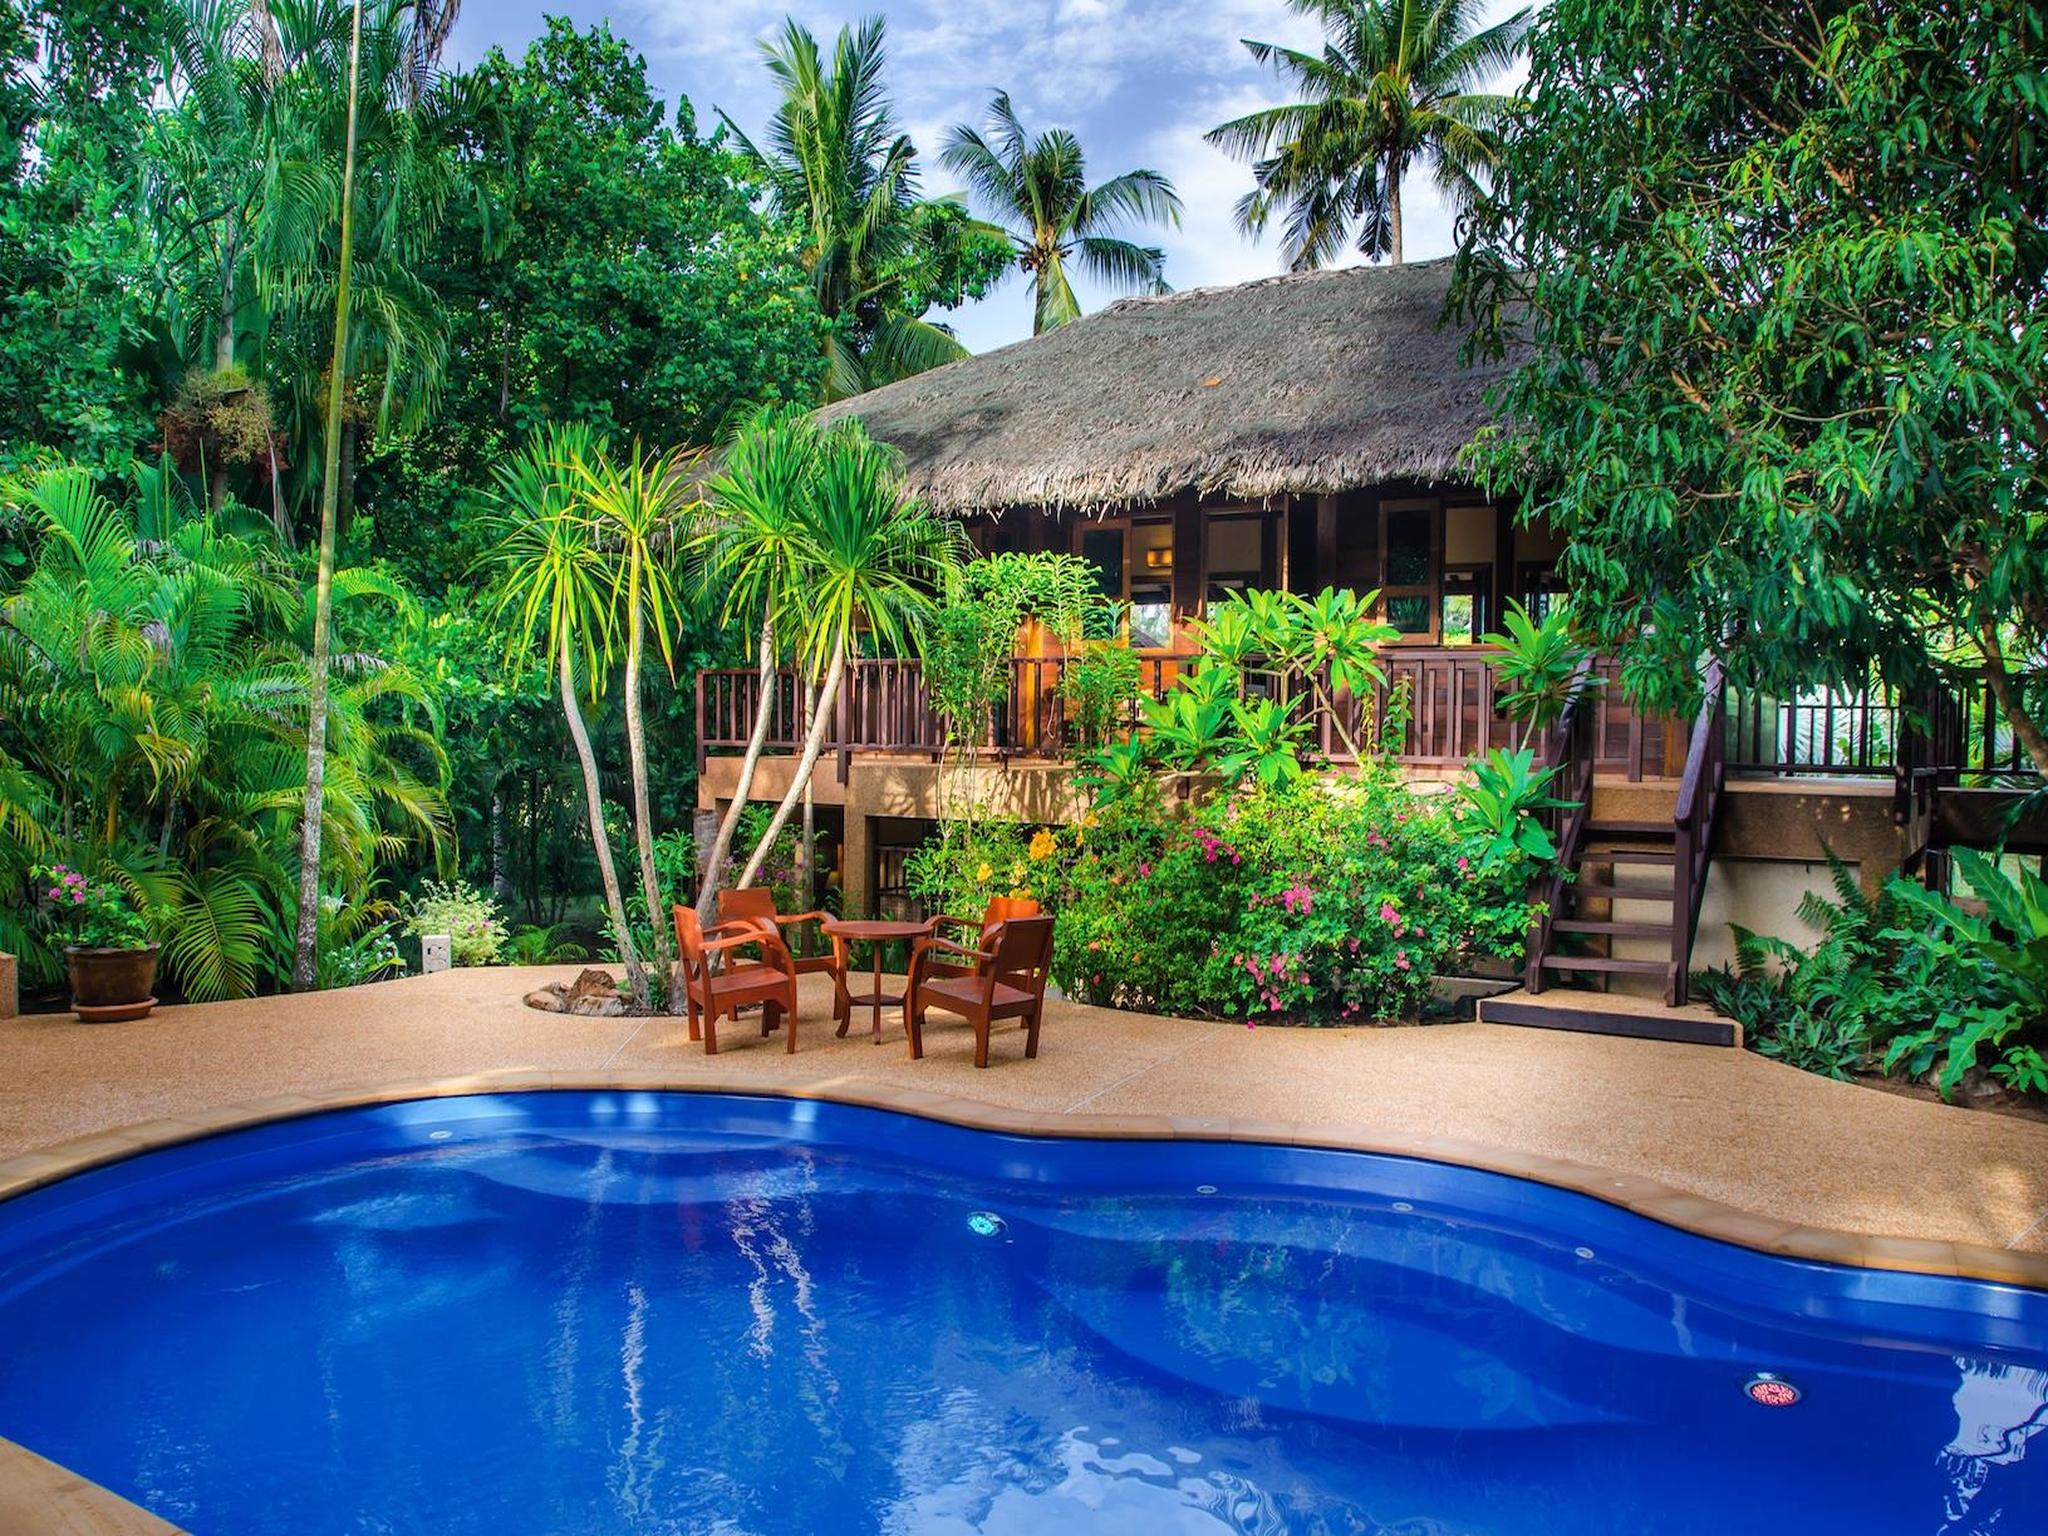 Koh Jum Beach Villas เกาะจัม บีช วิลลา